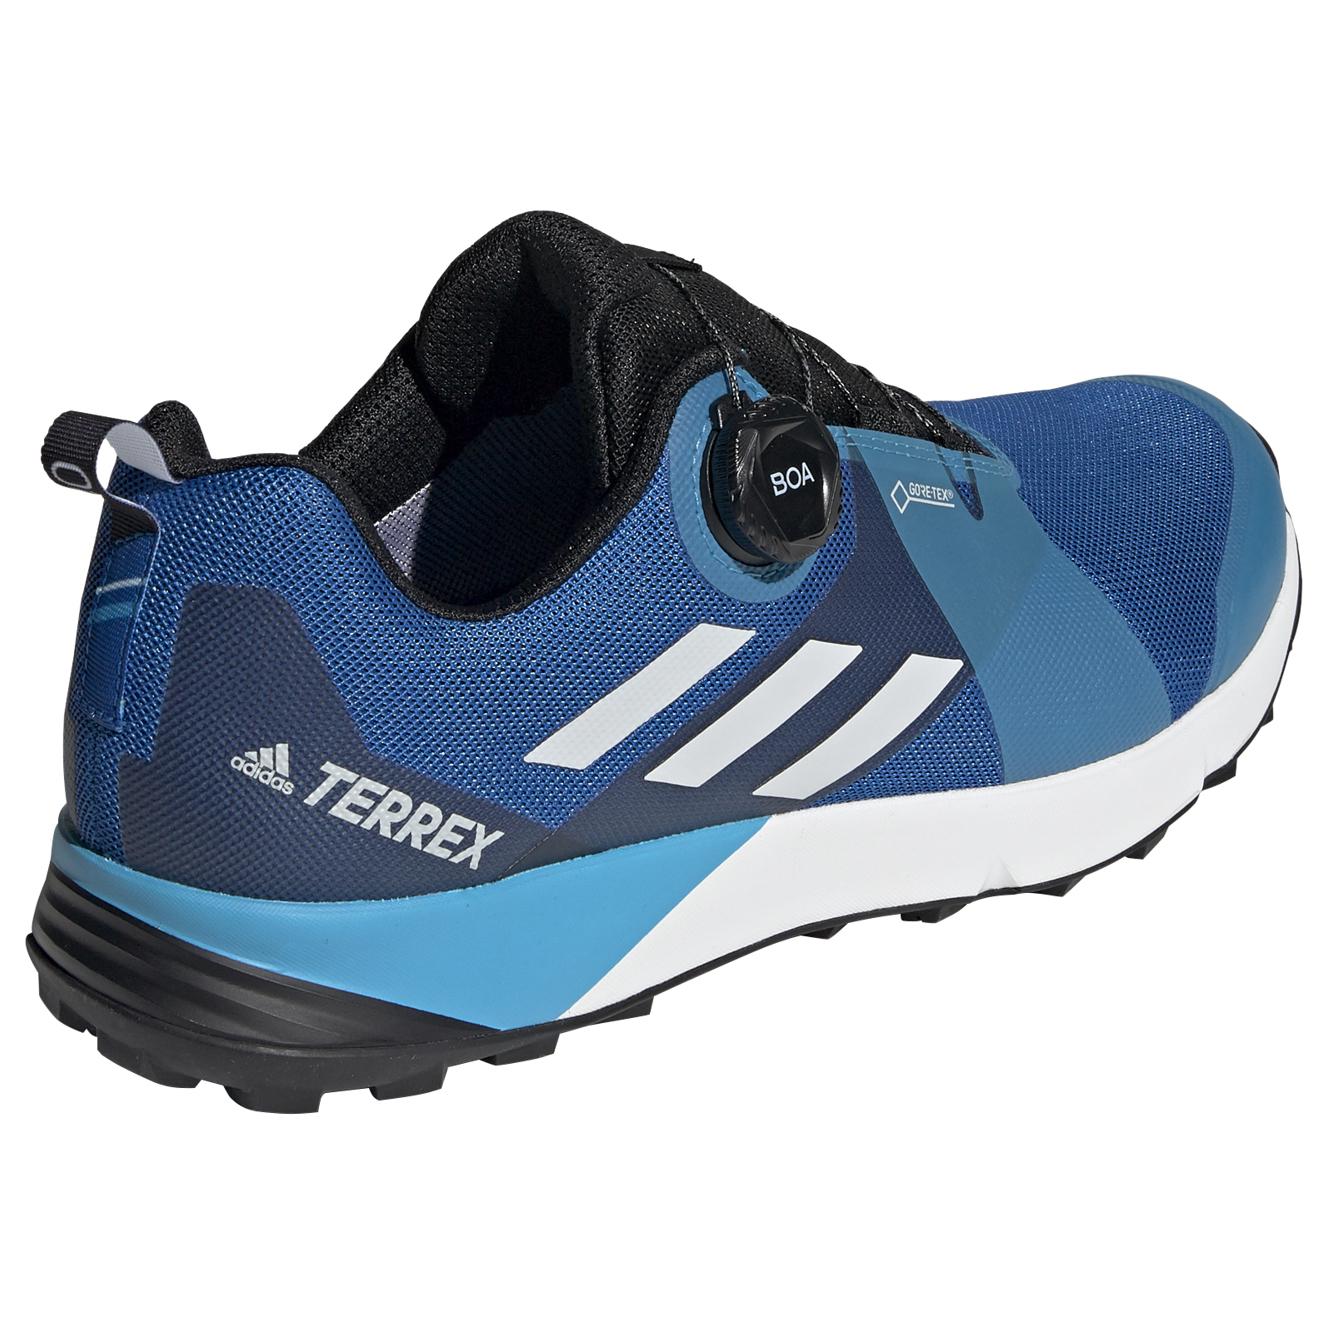 Adidas Terrex Two Boa GTX - Trail